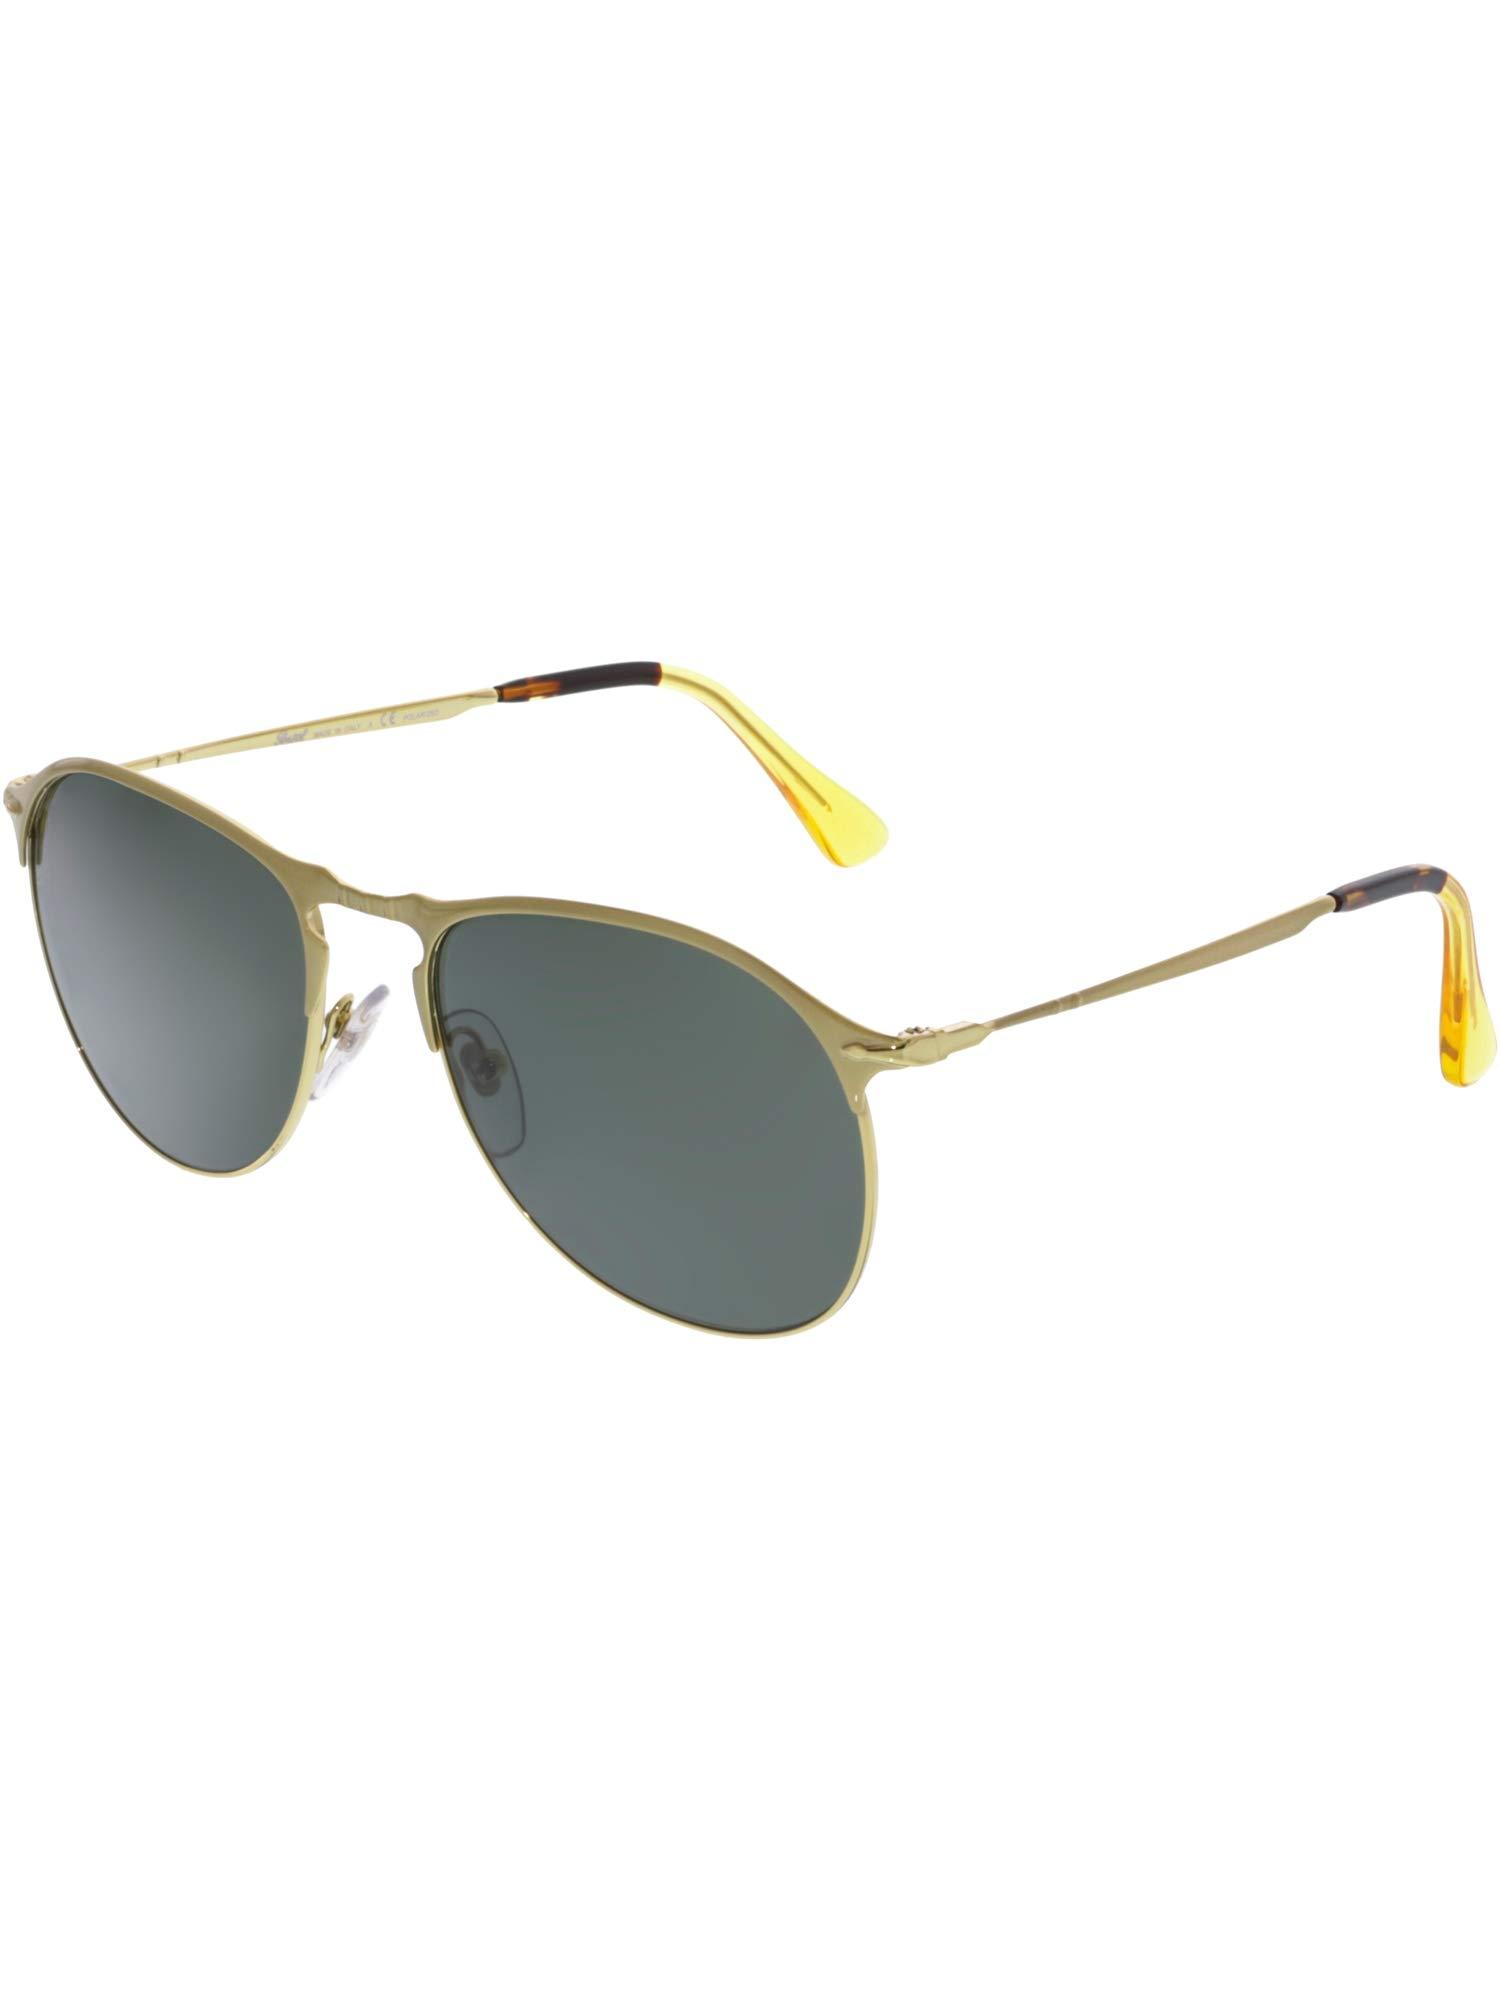 ویکالا · خرید  اصل اورجینال · خرید از آمازون · Persol Mens Sunglasses Gold/Green Metal - Polarized - 56mm wekala · ویکالا